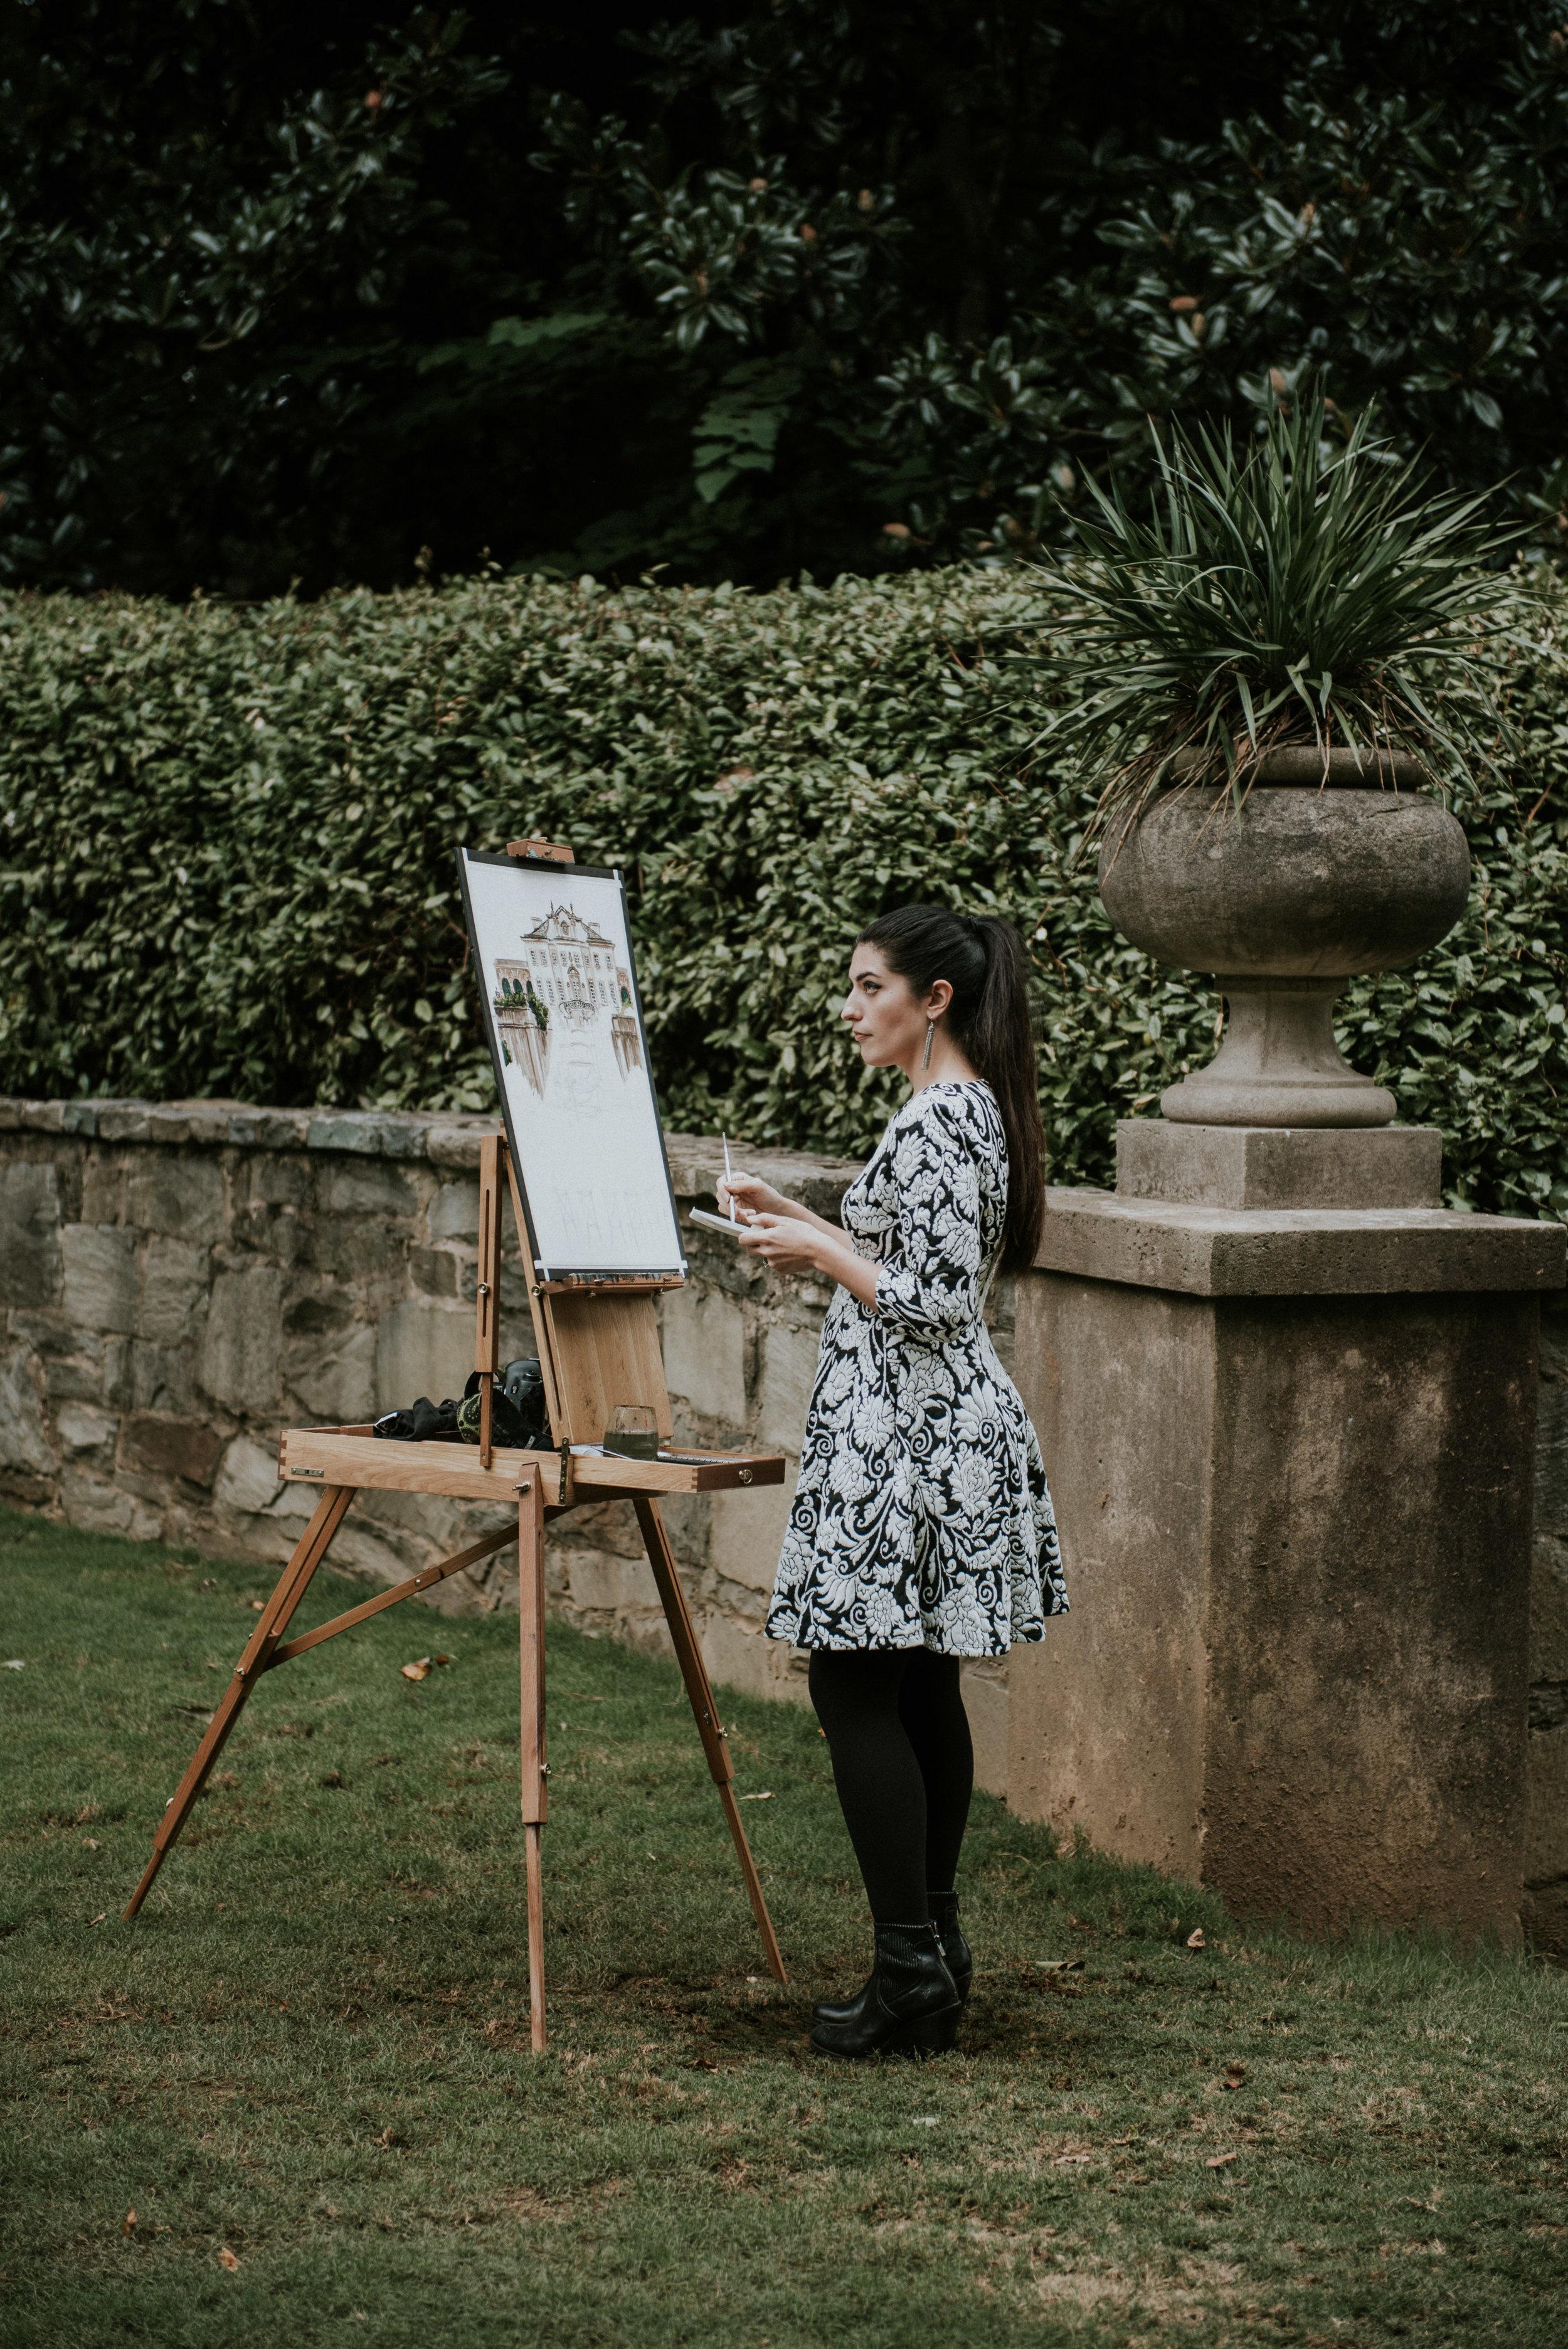 Maggie Smith Kuhn live paints wedding ceremony